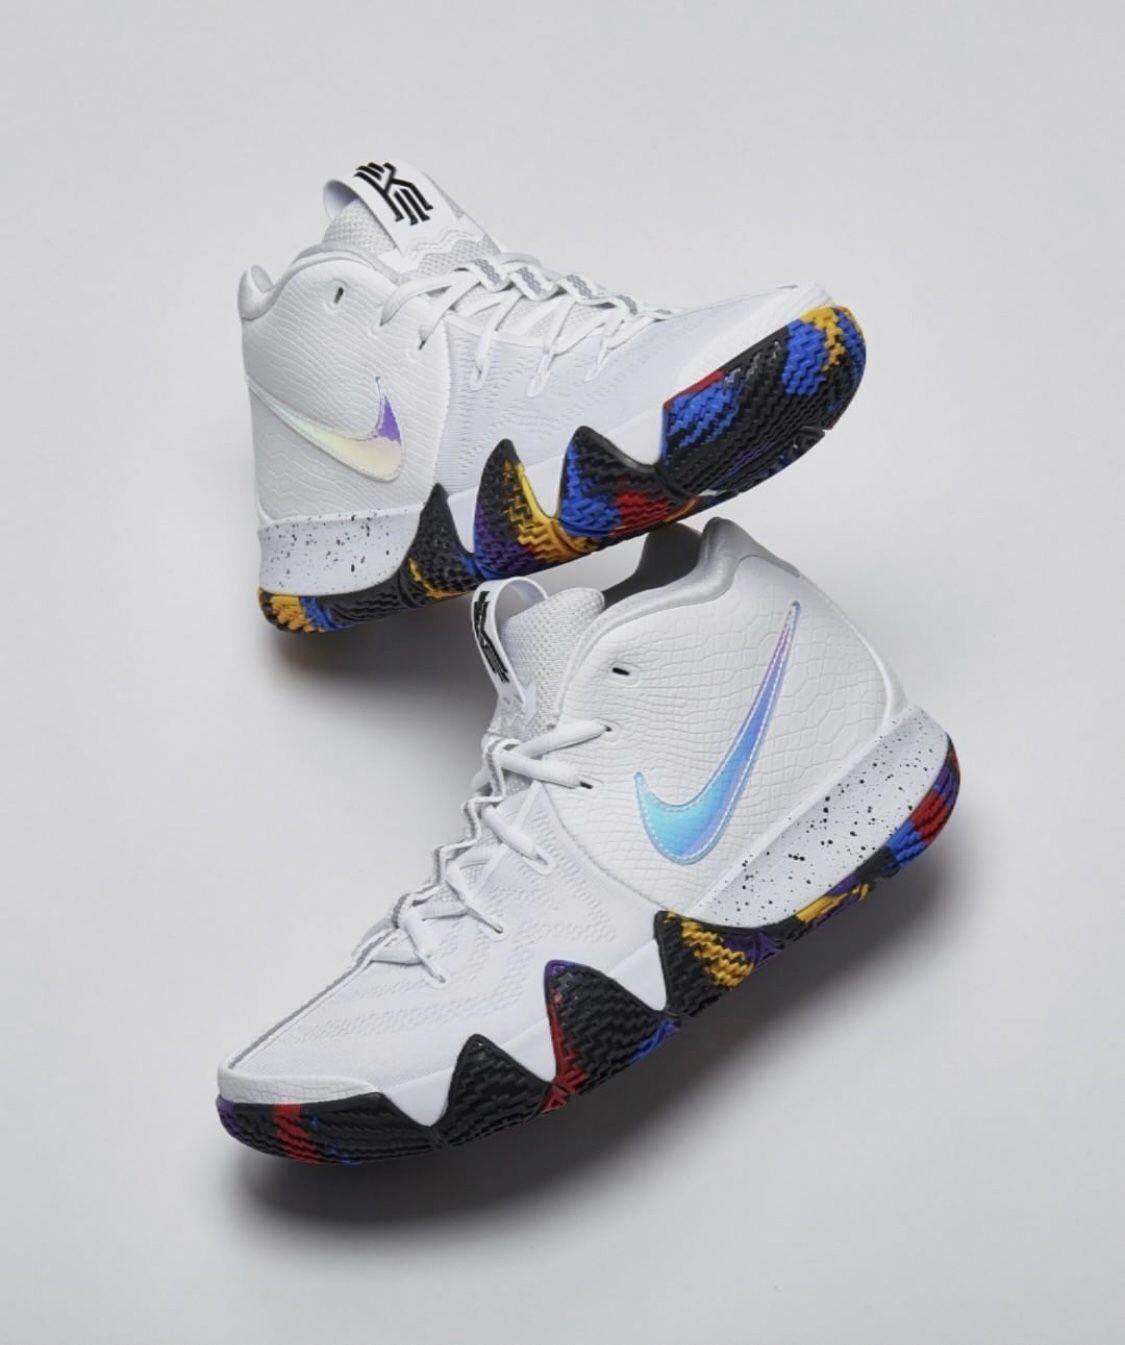 Basketball Legends Y8 Discountbasketballgoals Kidsbasketballgames Girls Basketball Shoes Basketball Shoes Kyrie Nike Basketball Shoes